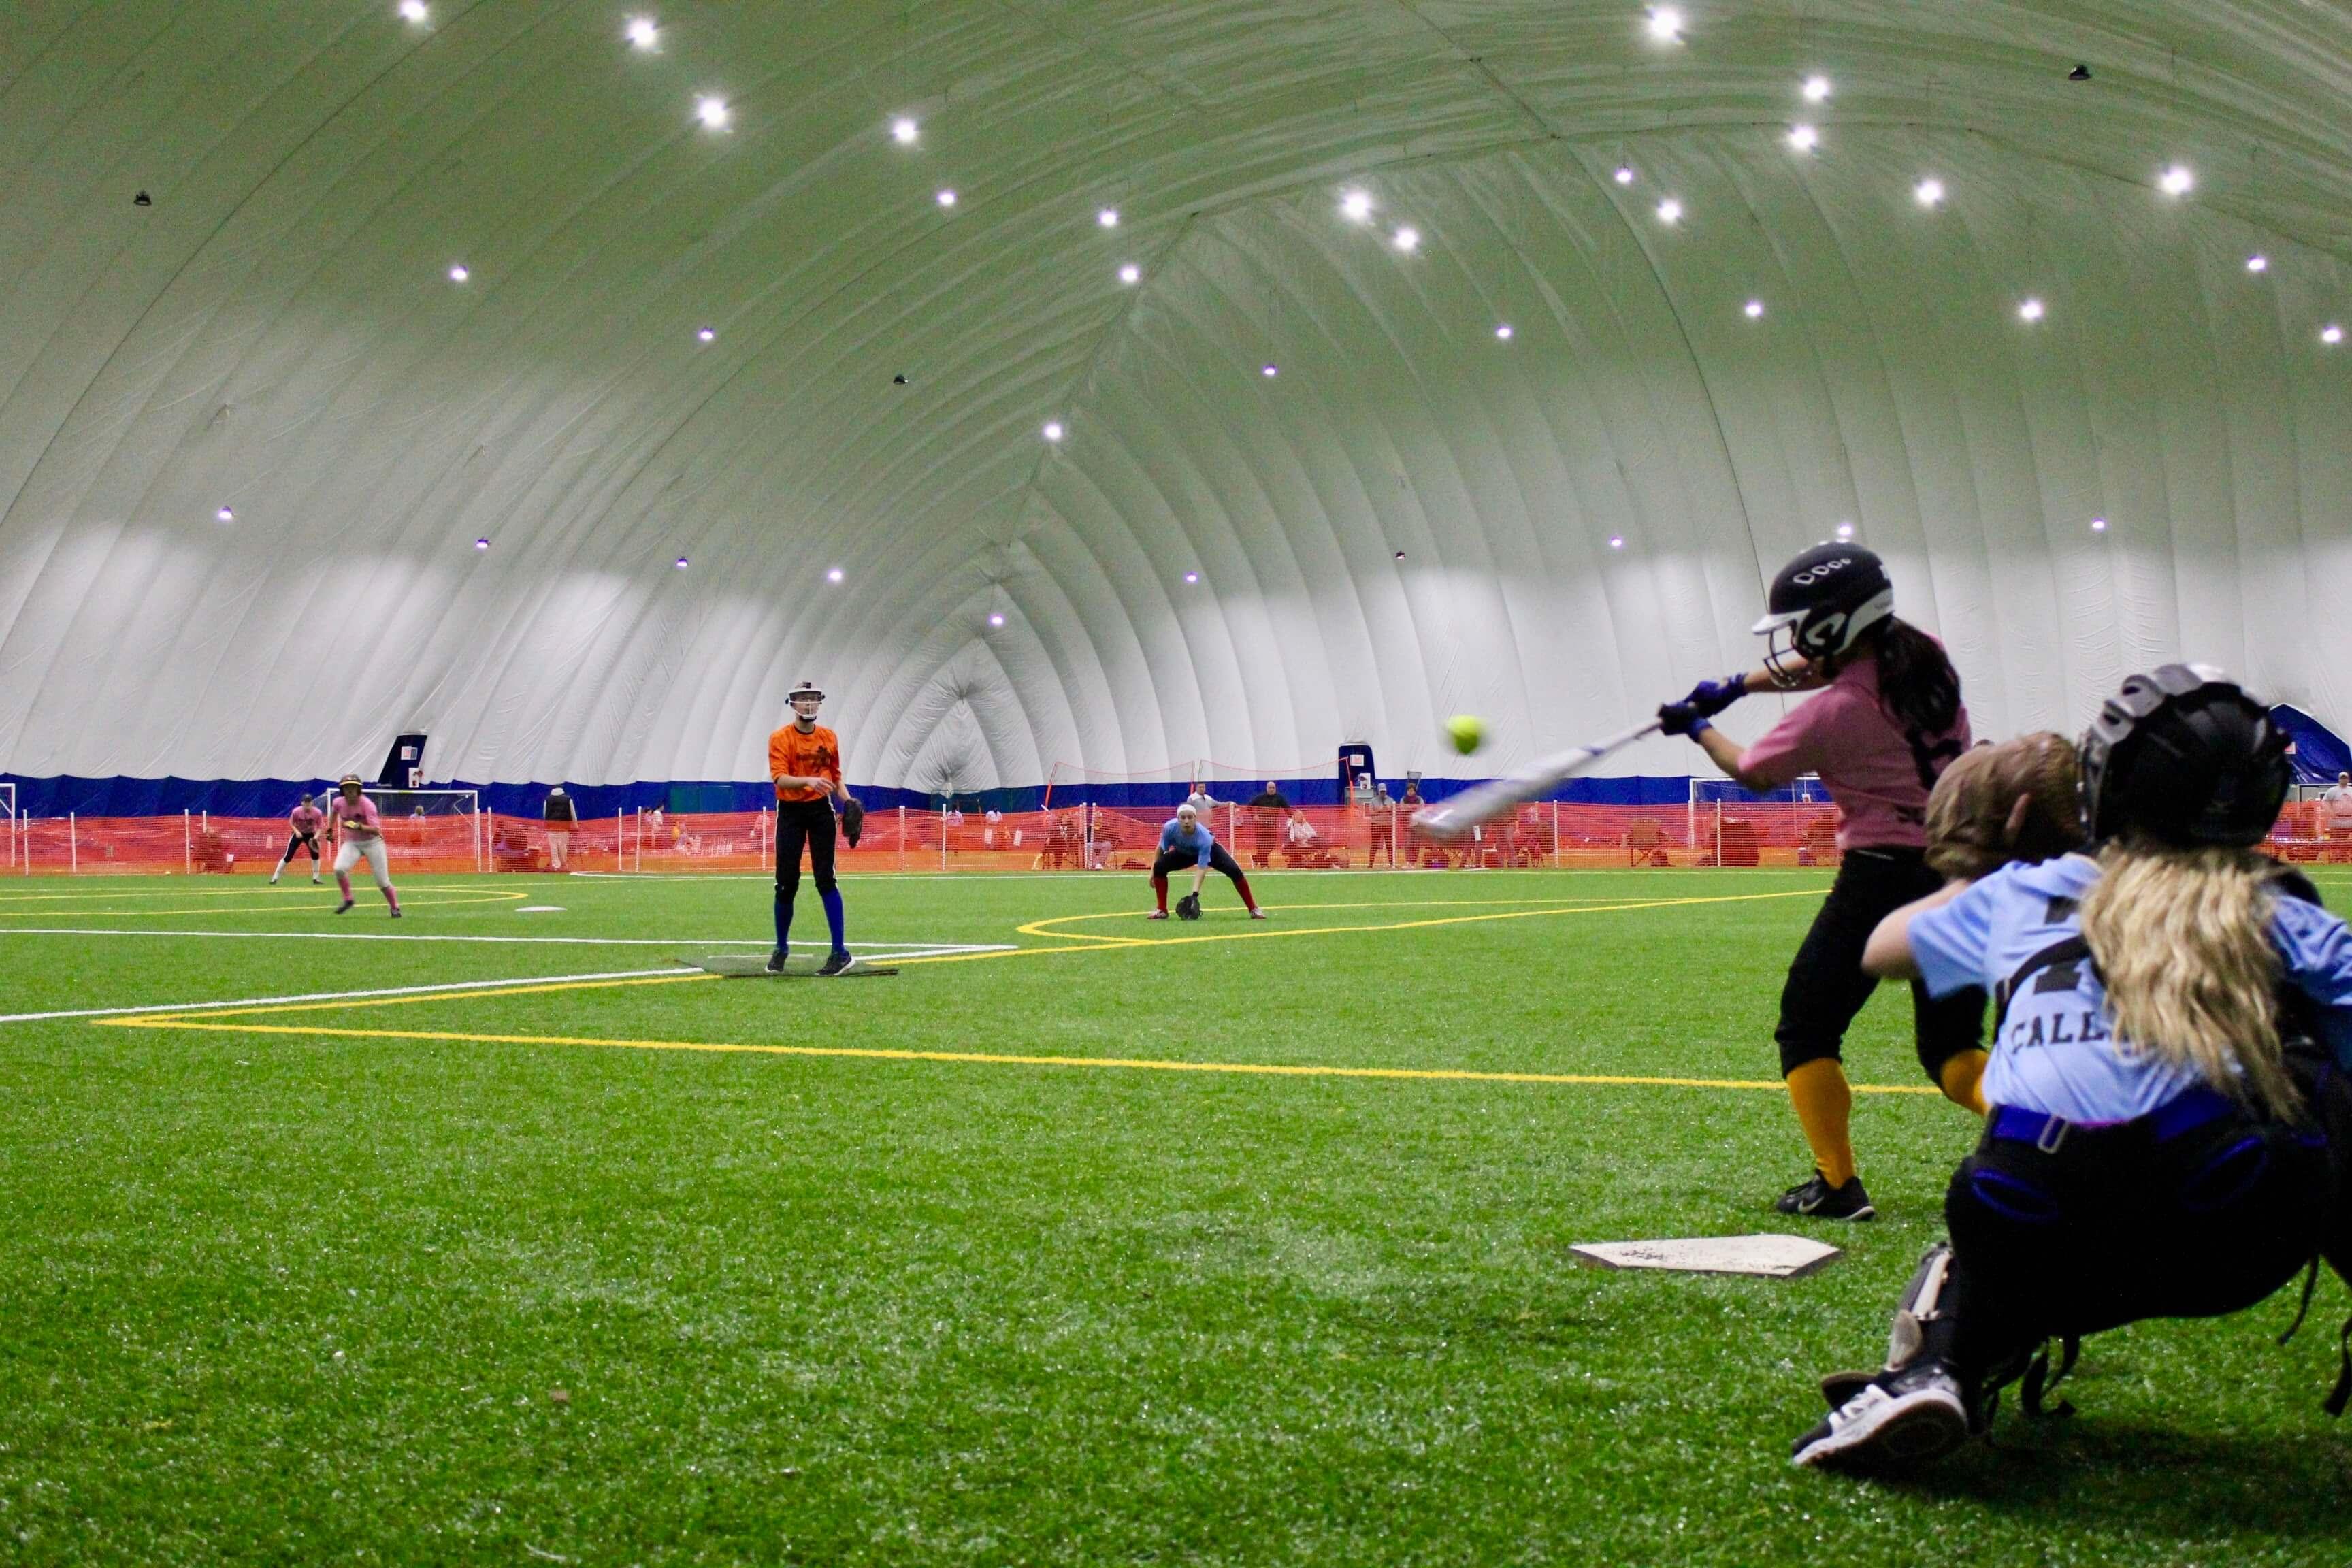 Softball  Total Sports Complex